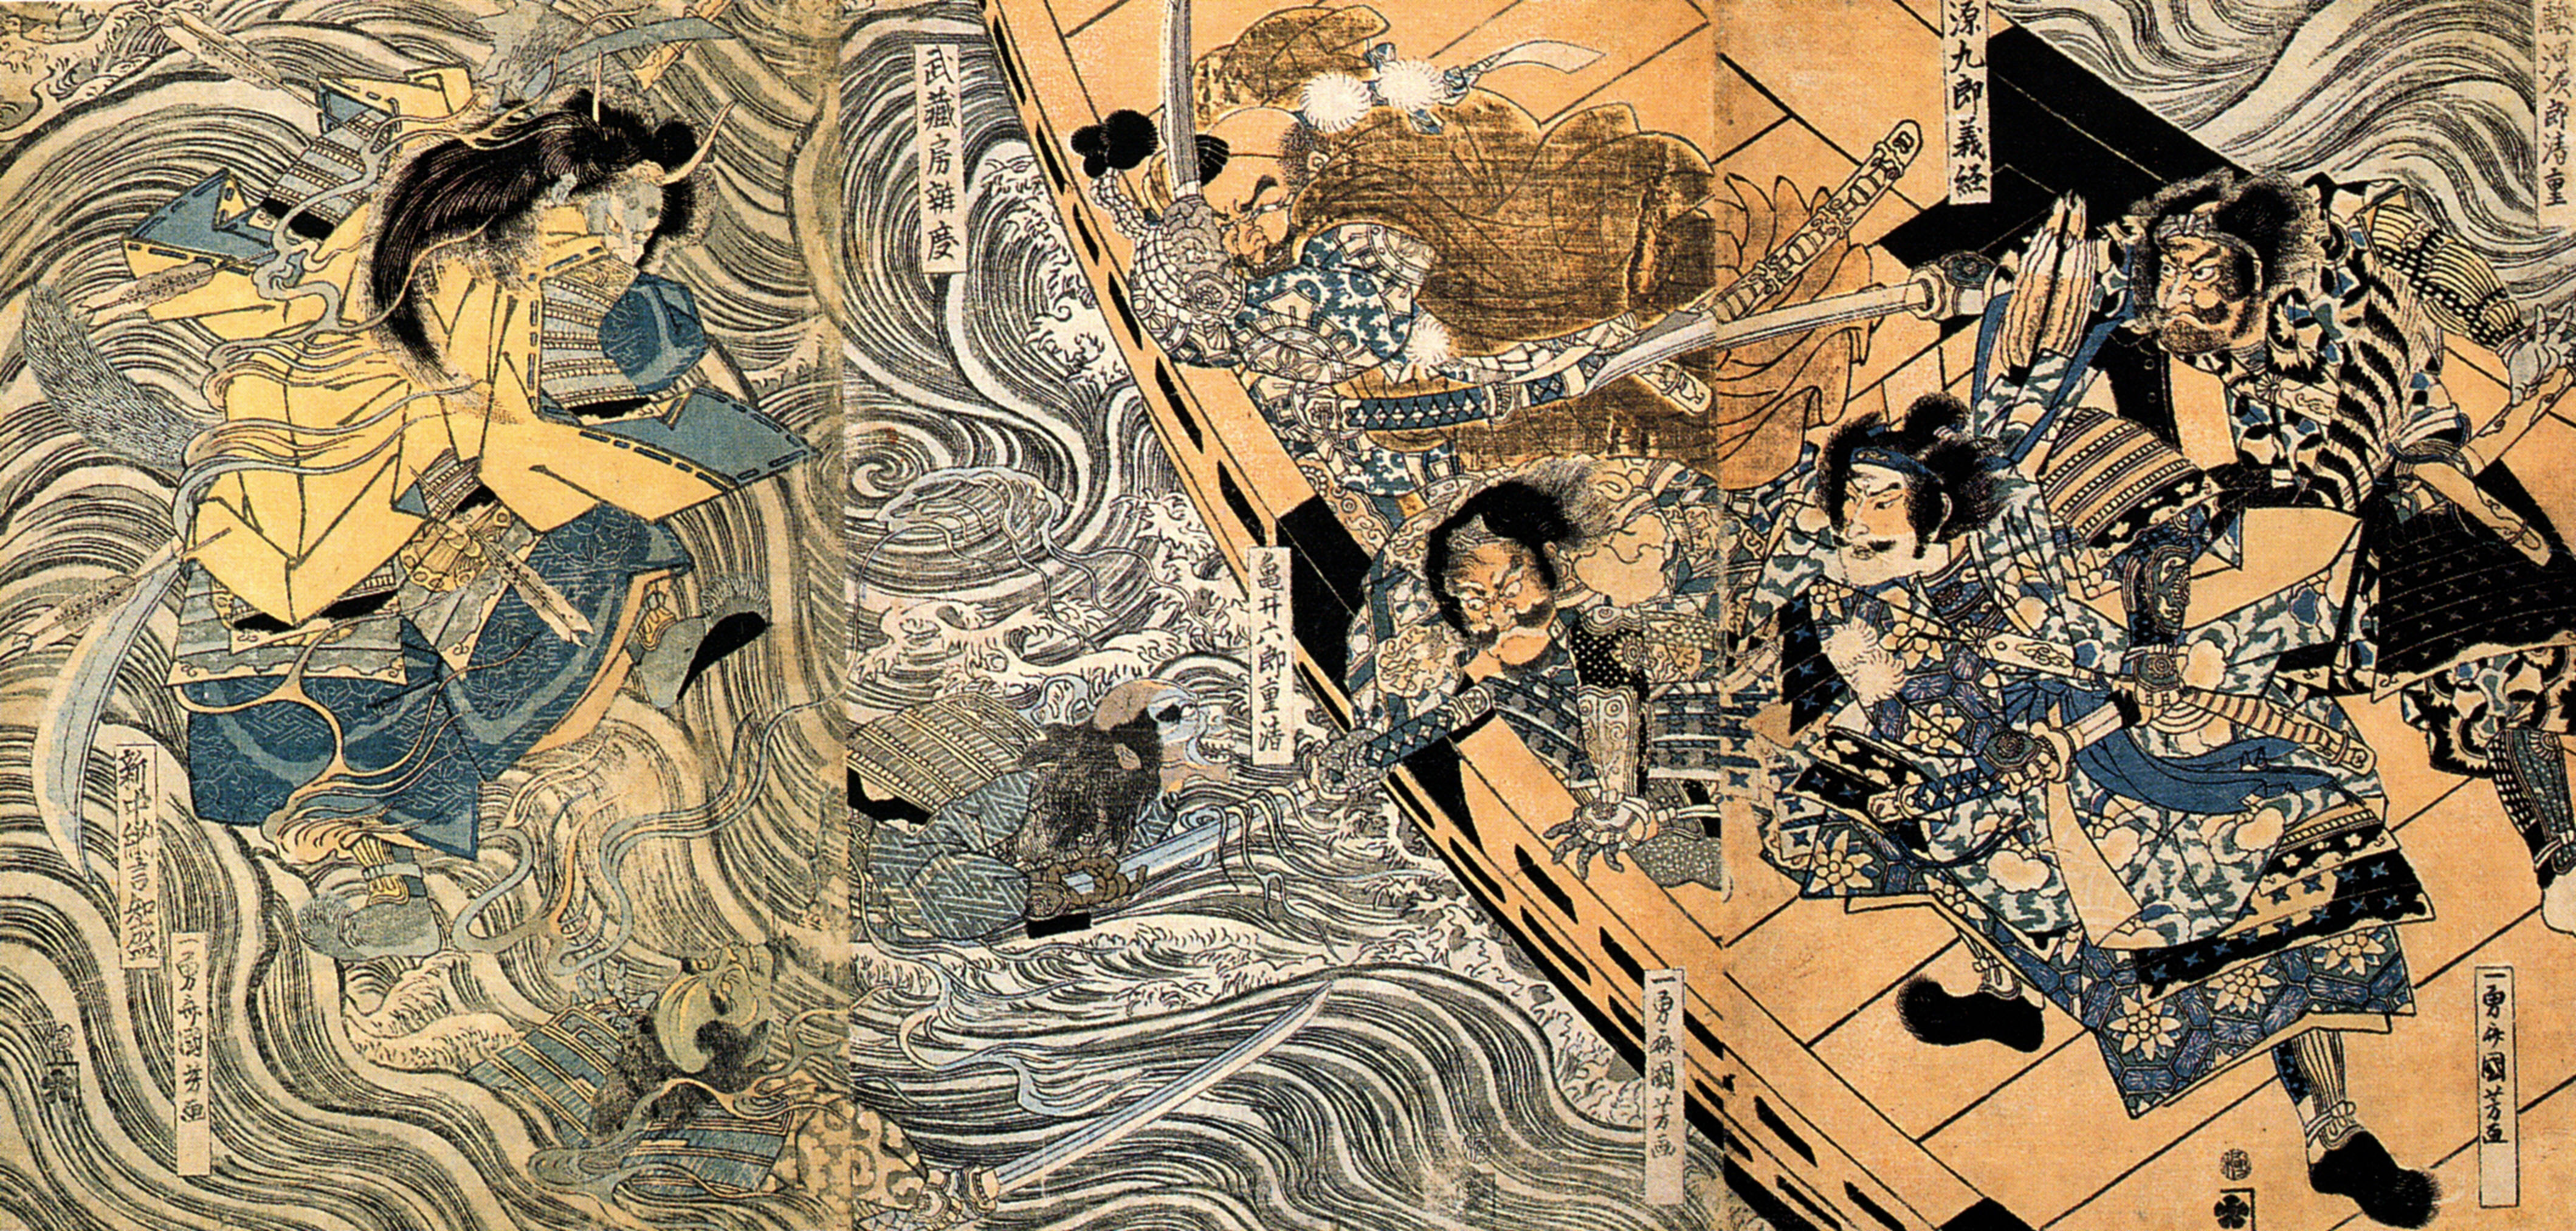 Resultado de imagen de utagawa kuniyoshi samurai